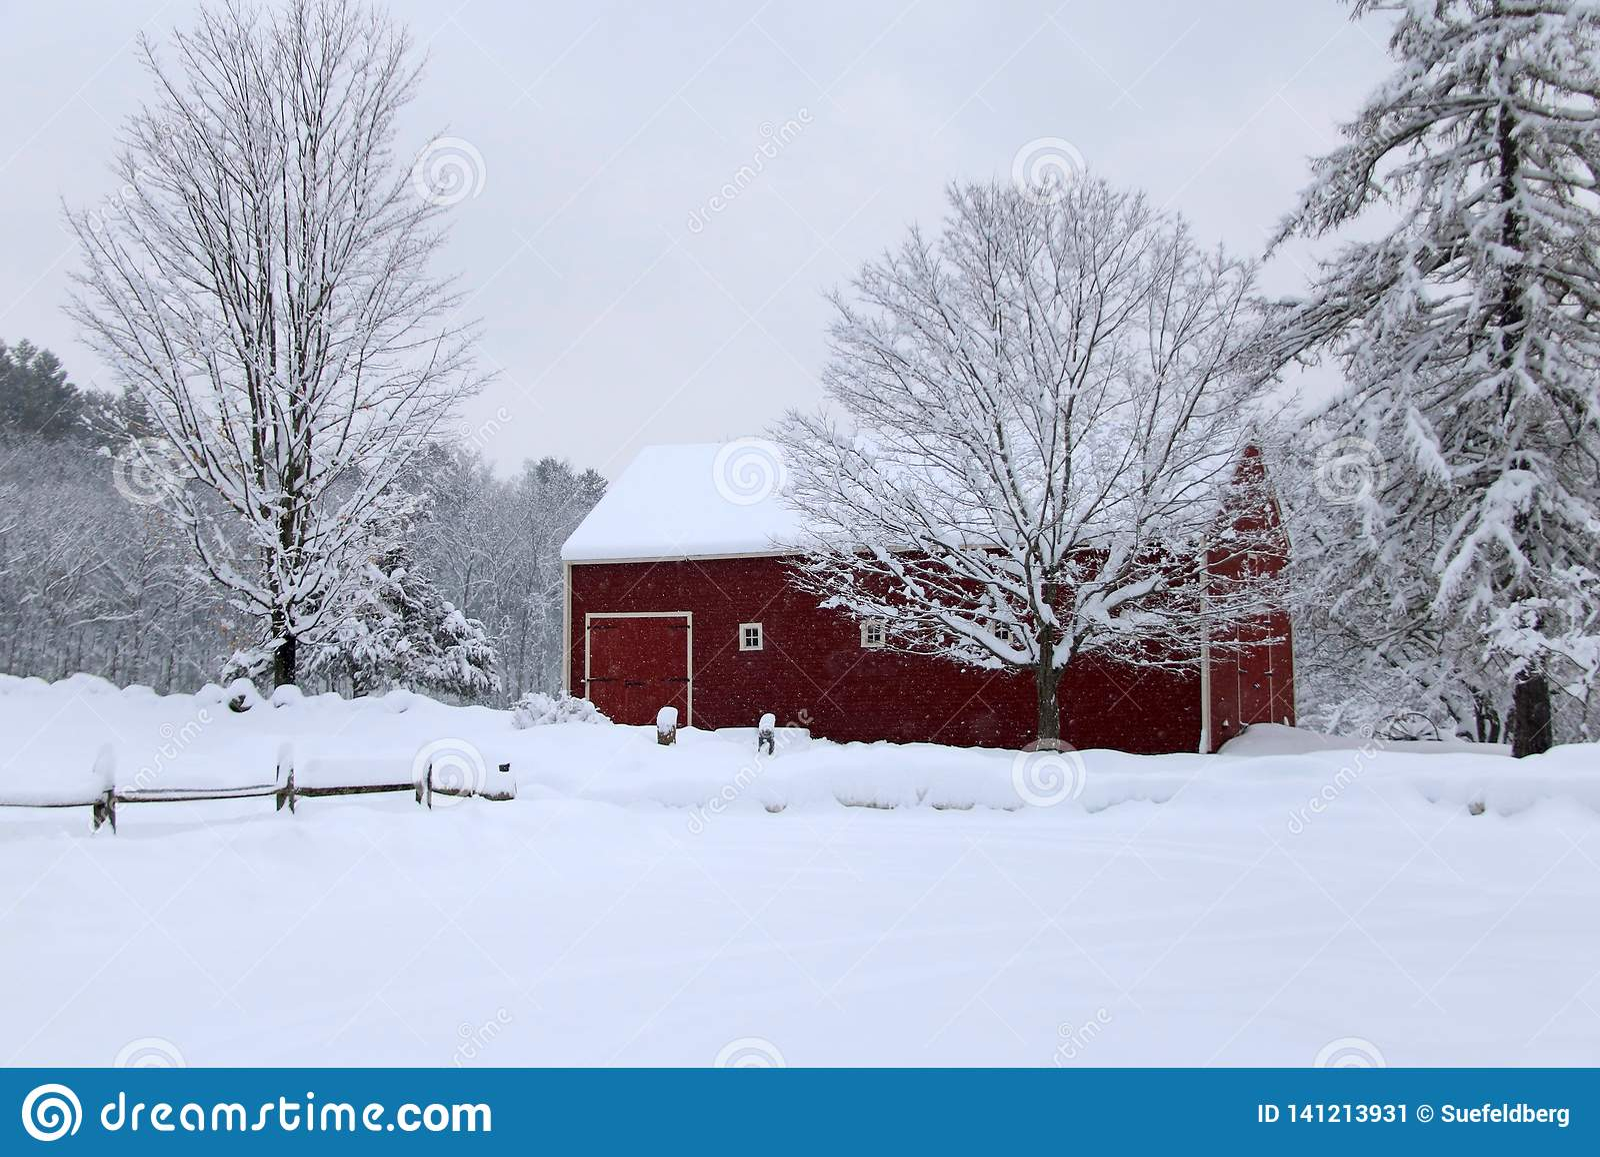 Snowy Winter Barn In New England